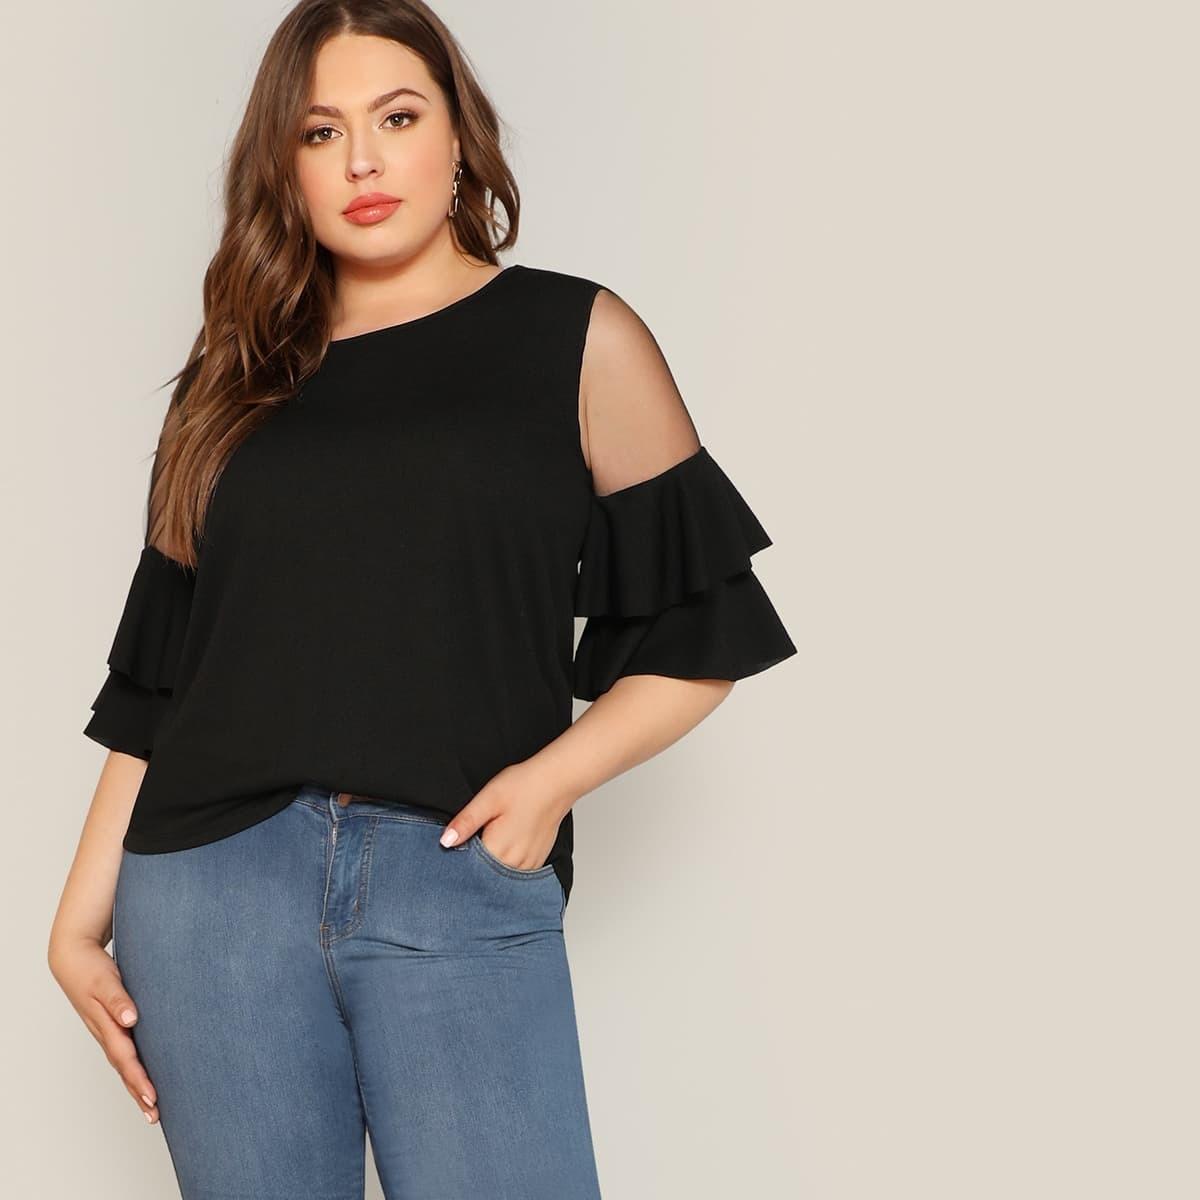 Zwart Elegant Vlak Grote maten blouses Rimpeling